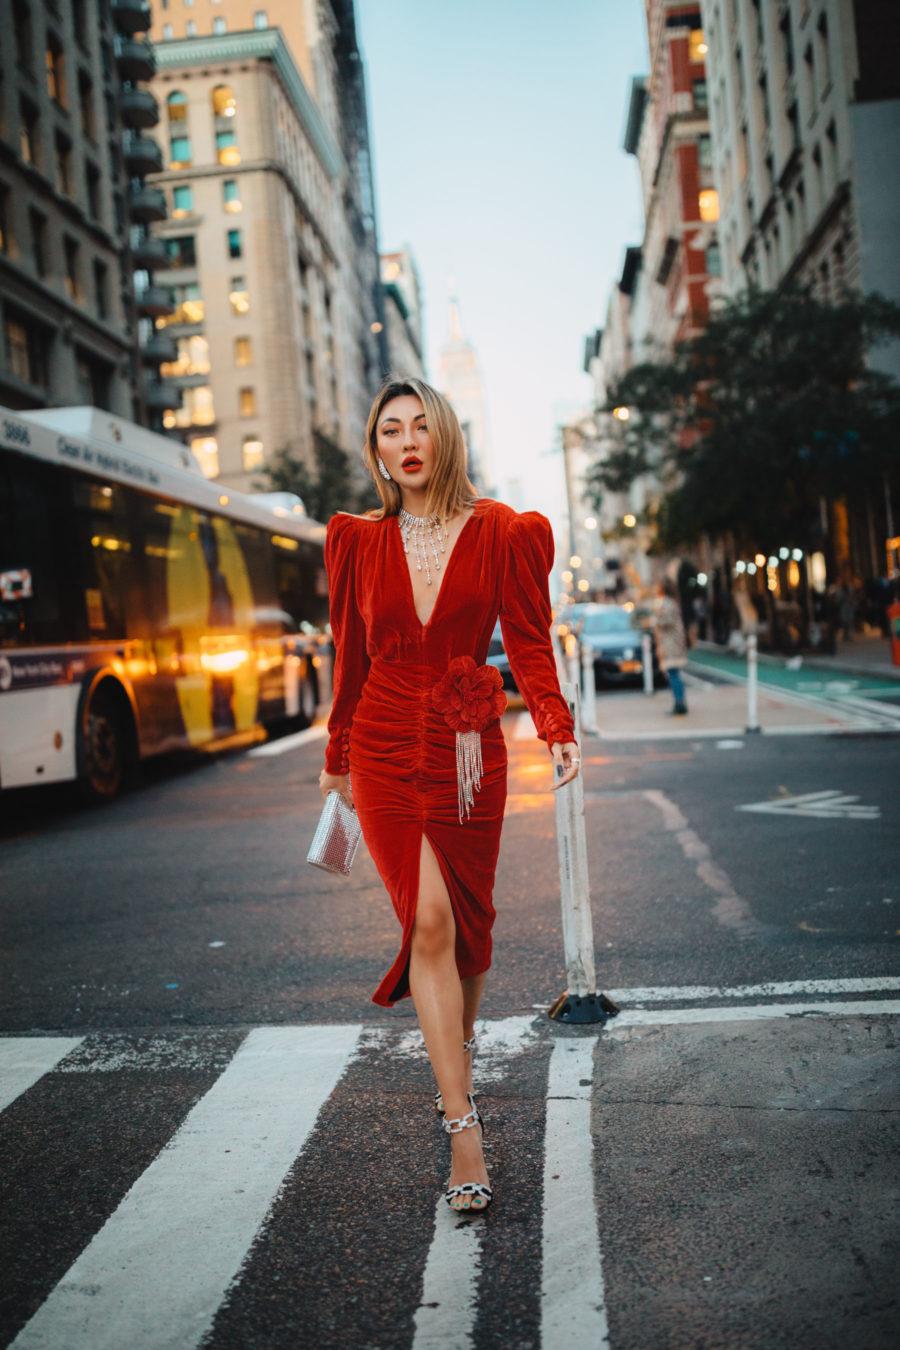 fashion blogger jessica wang wearing Marianna Senchina Velvet Midi dress and chain heels with silver clutch // Notjessfashion.com